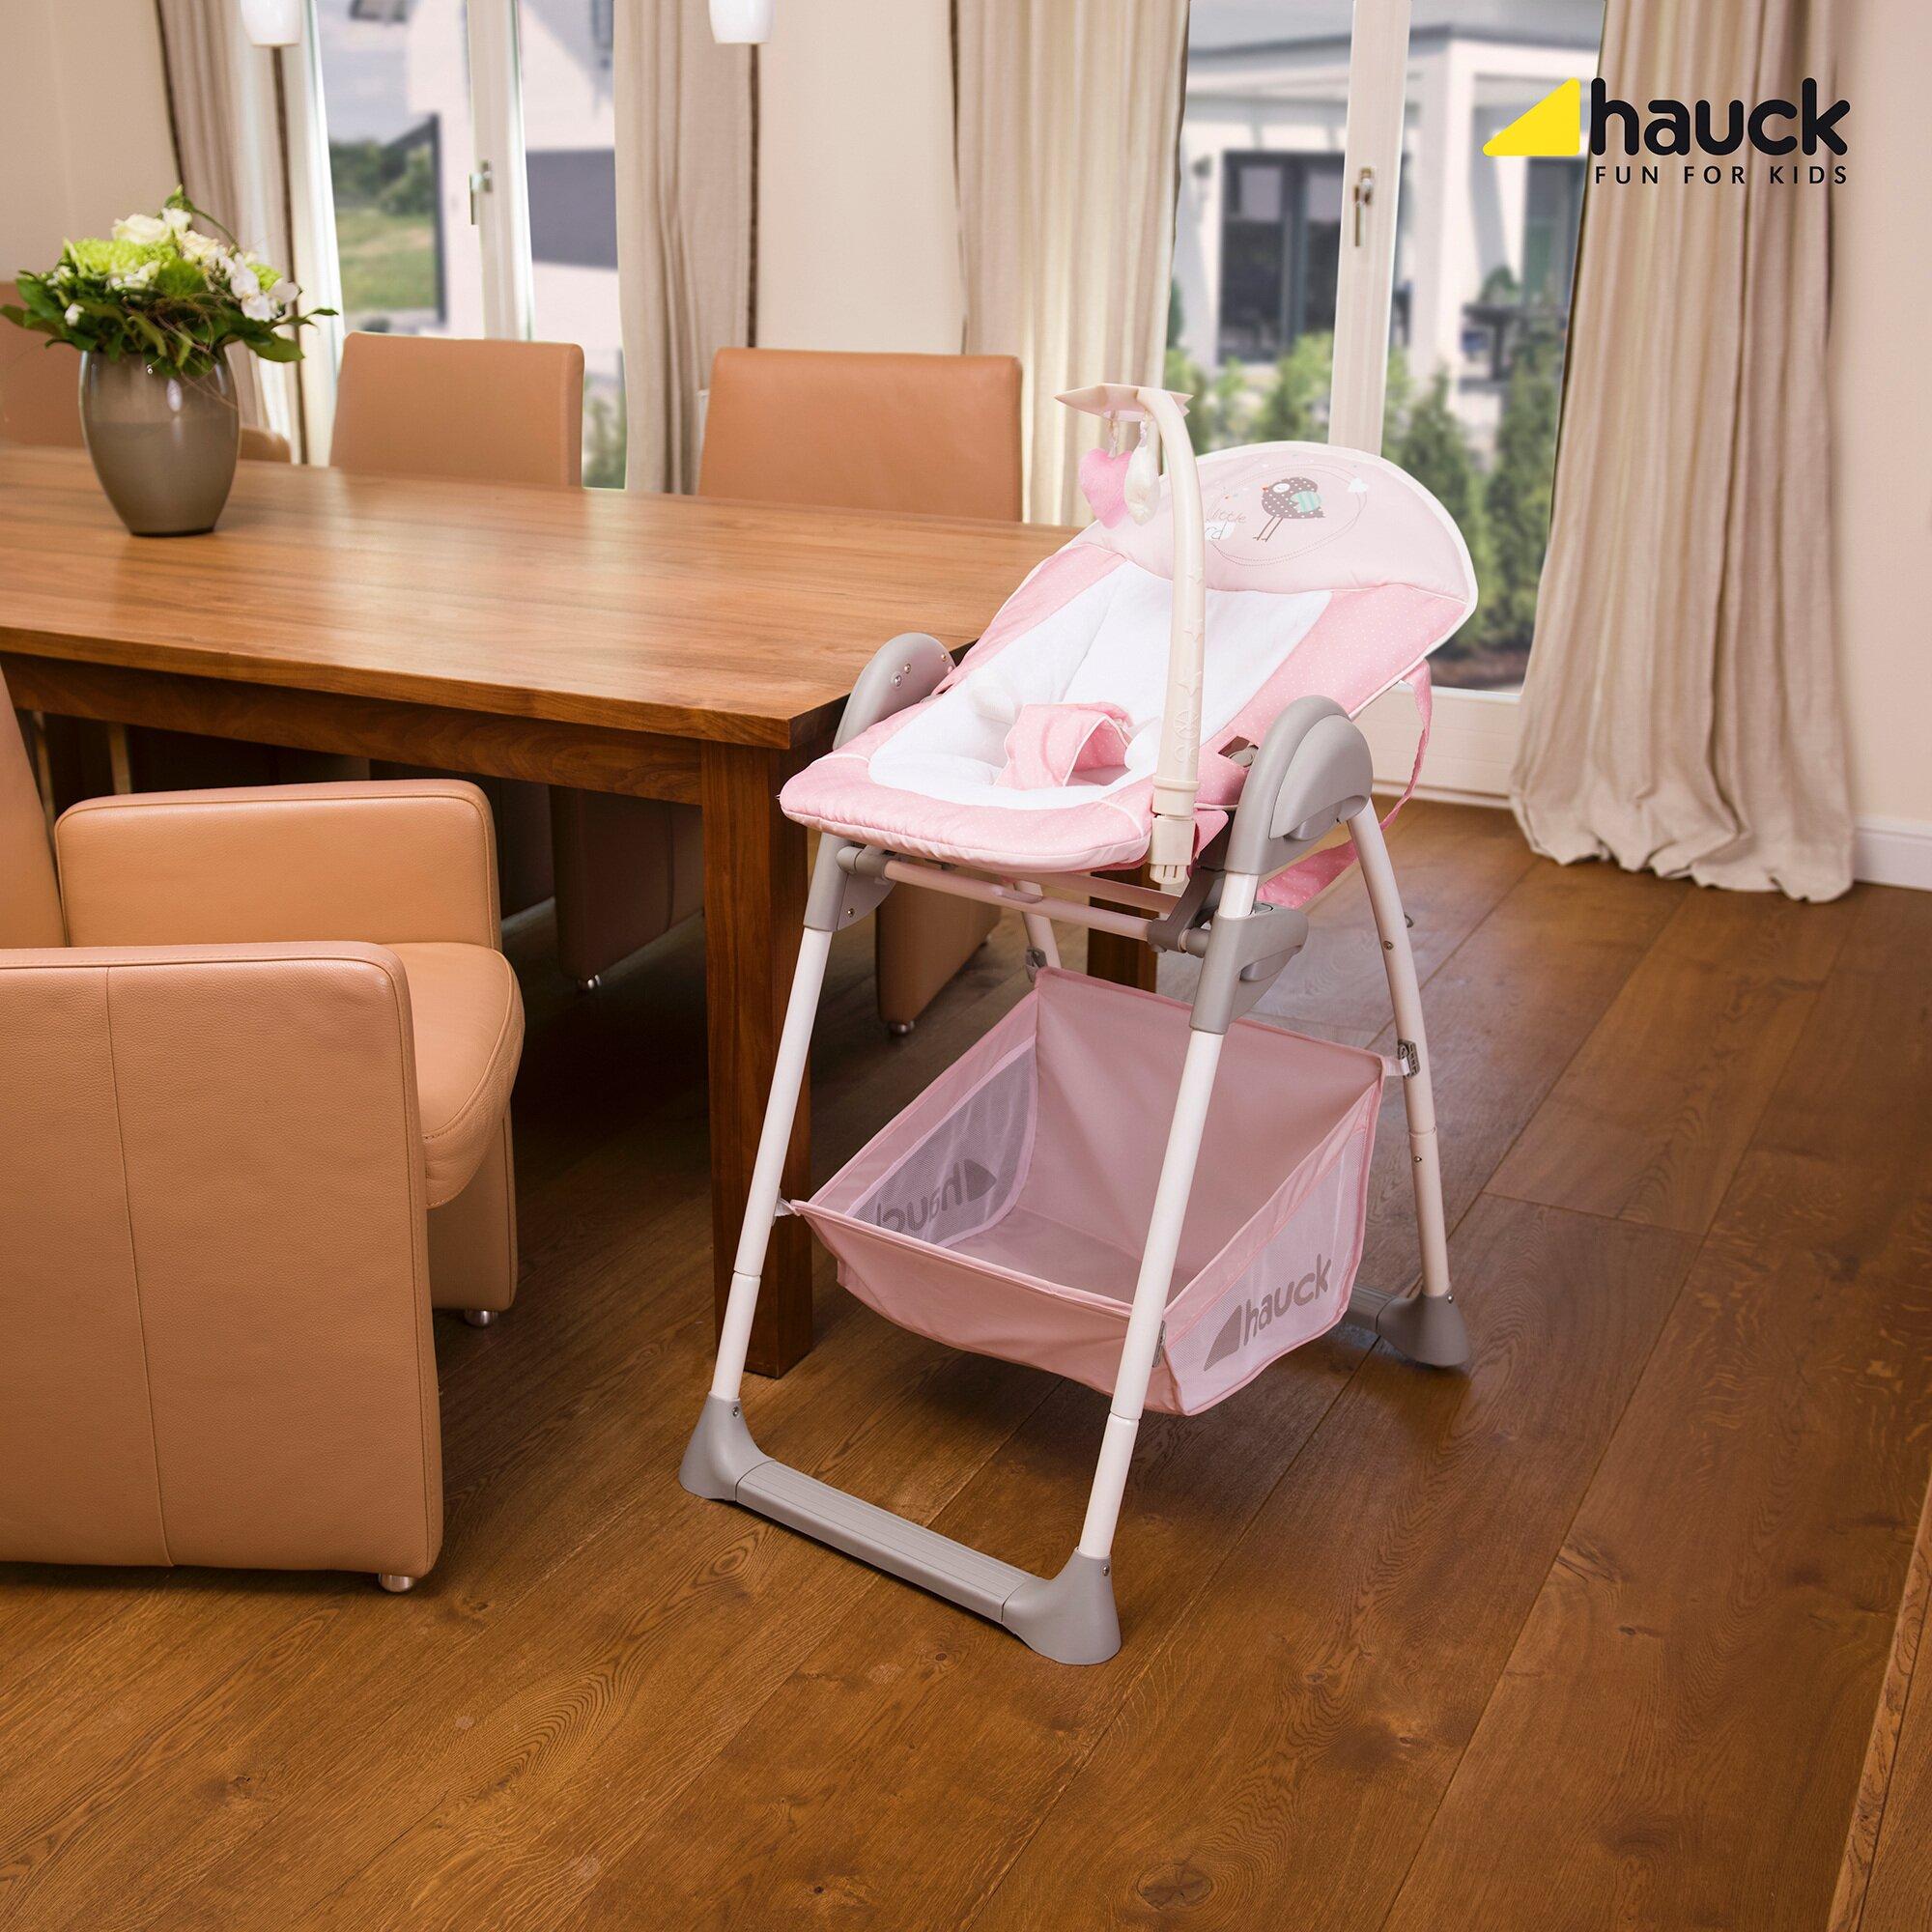 hauck-hochstuhl-sit-n-relax-rosa